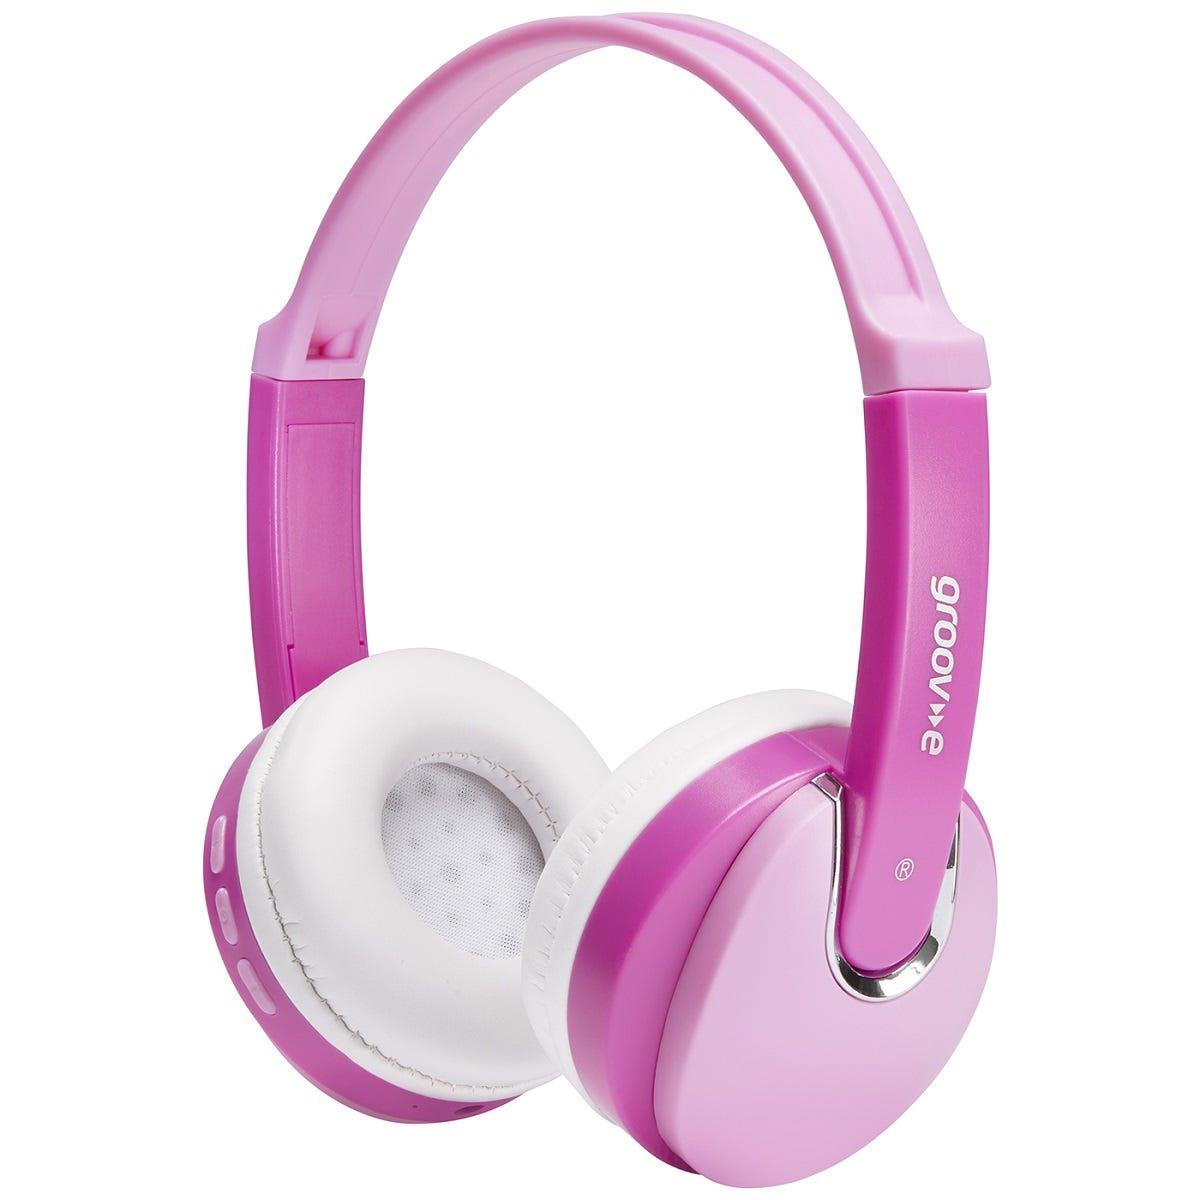 Groov-e Kids Wireless DJ Style Bluetooth Headphones - Pink